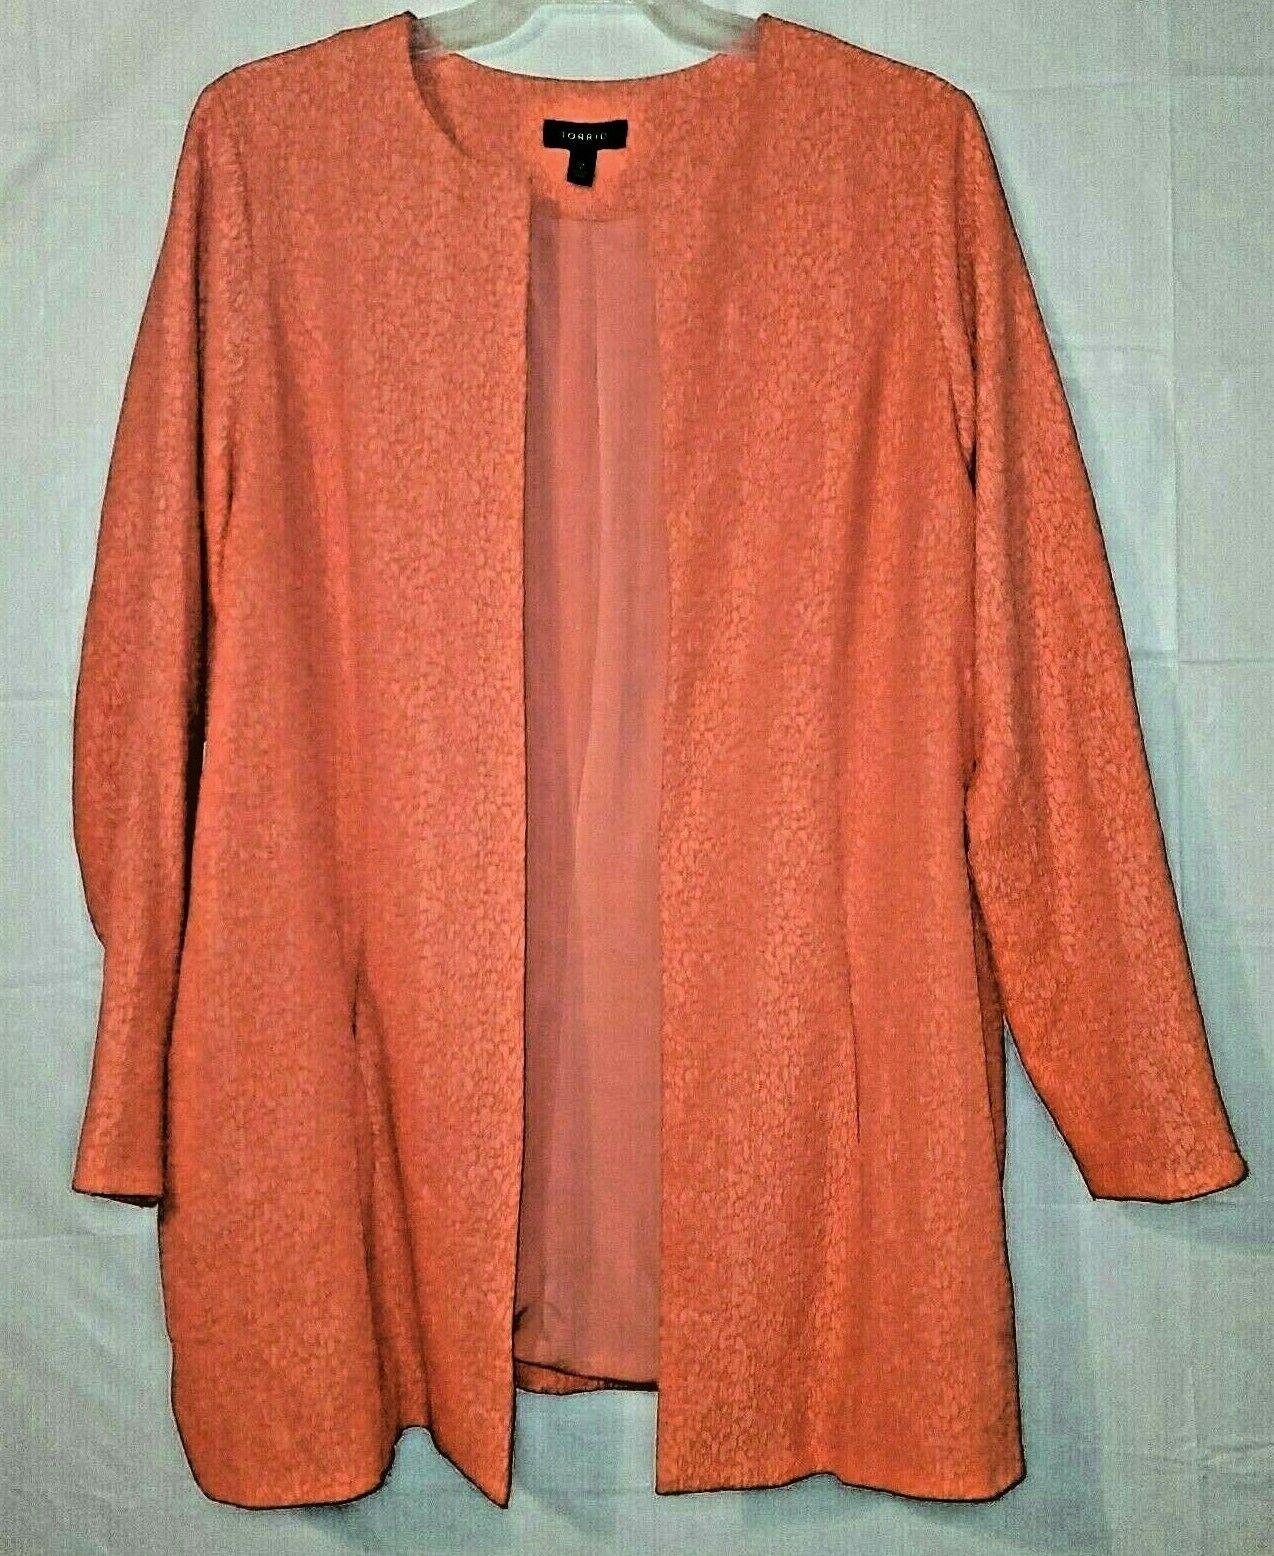 Torrid Size 2 Coral Orange Textured Midi Open Jacket Womens Plus Lined 2X XXL